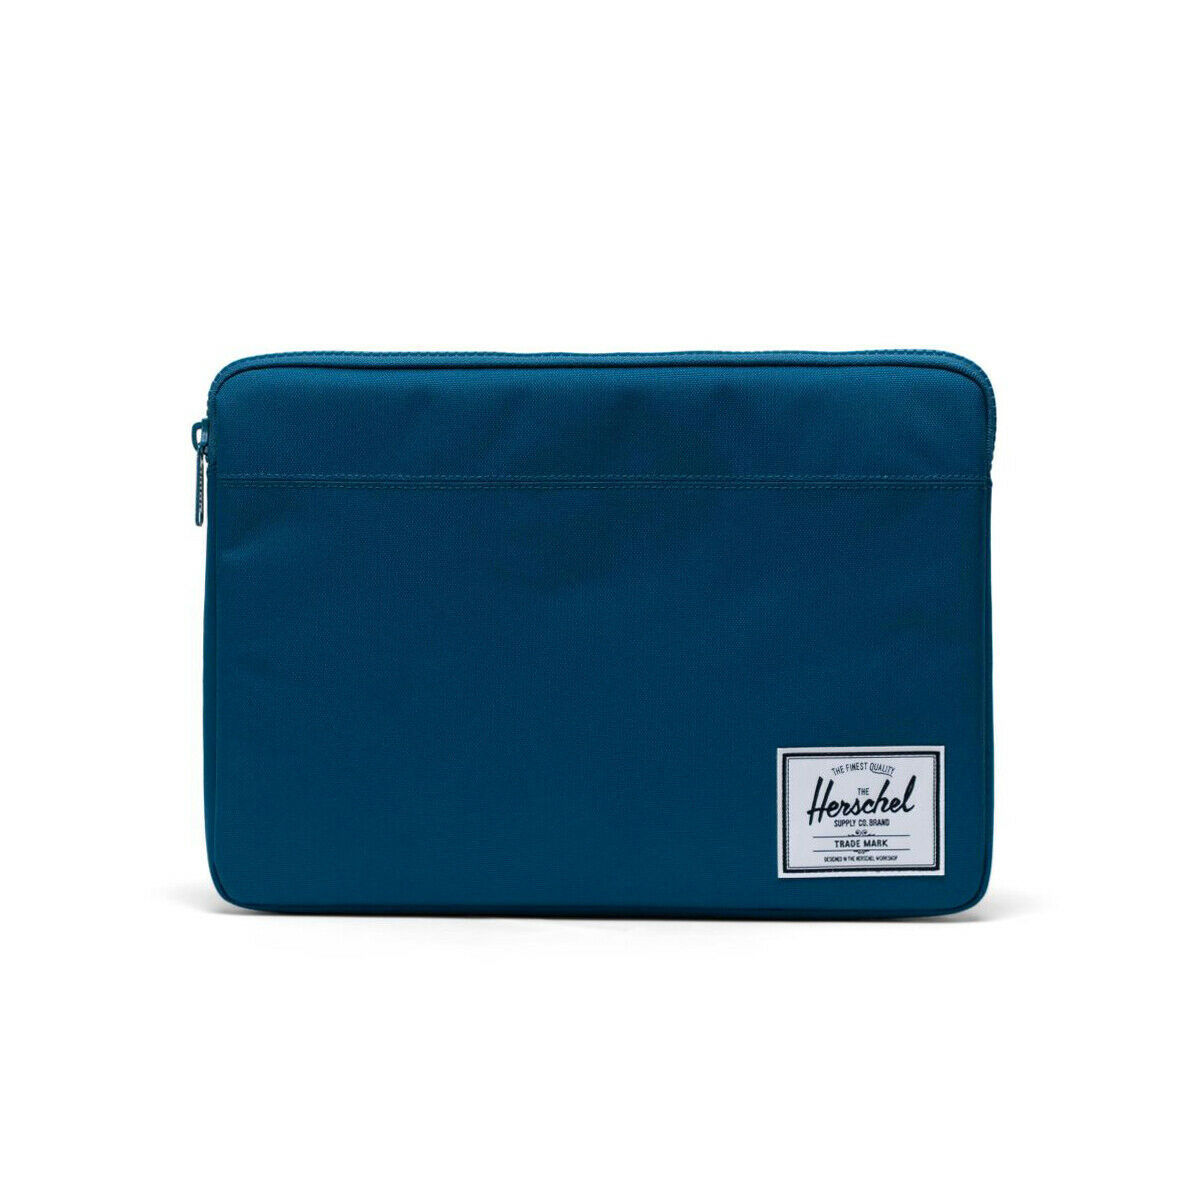 Custodia unisexherschel anchor sleeve for new inch macbook 10054-04904